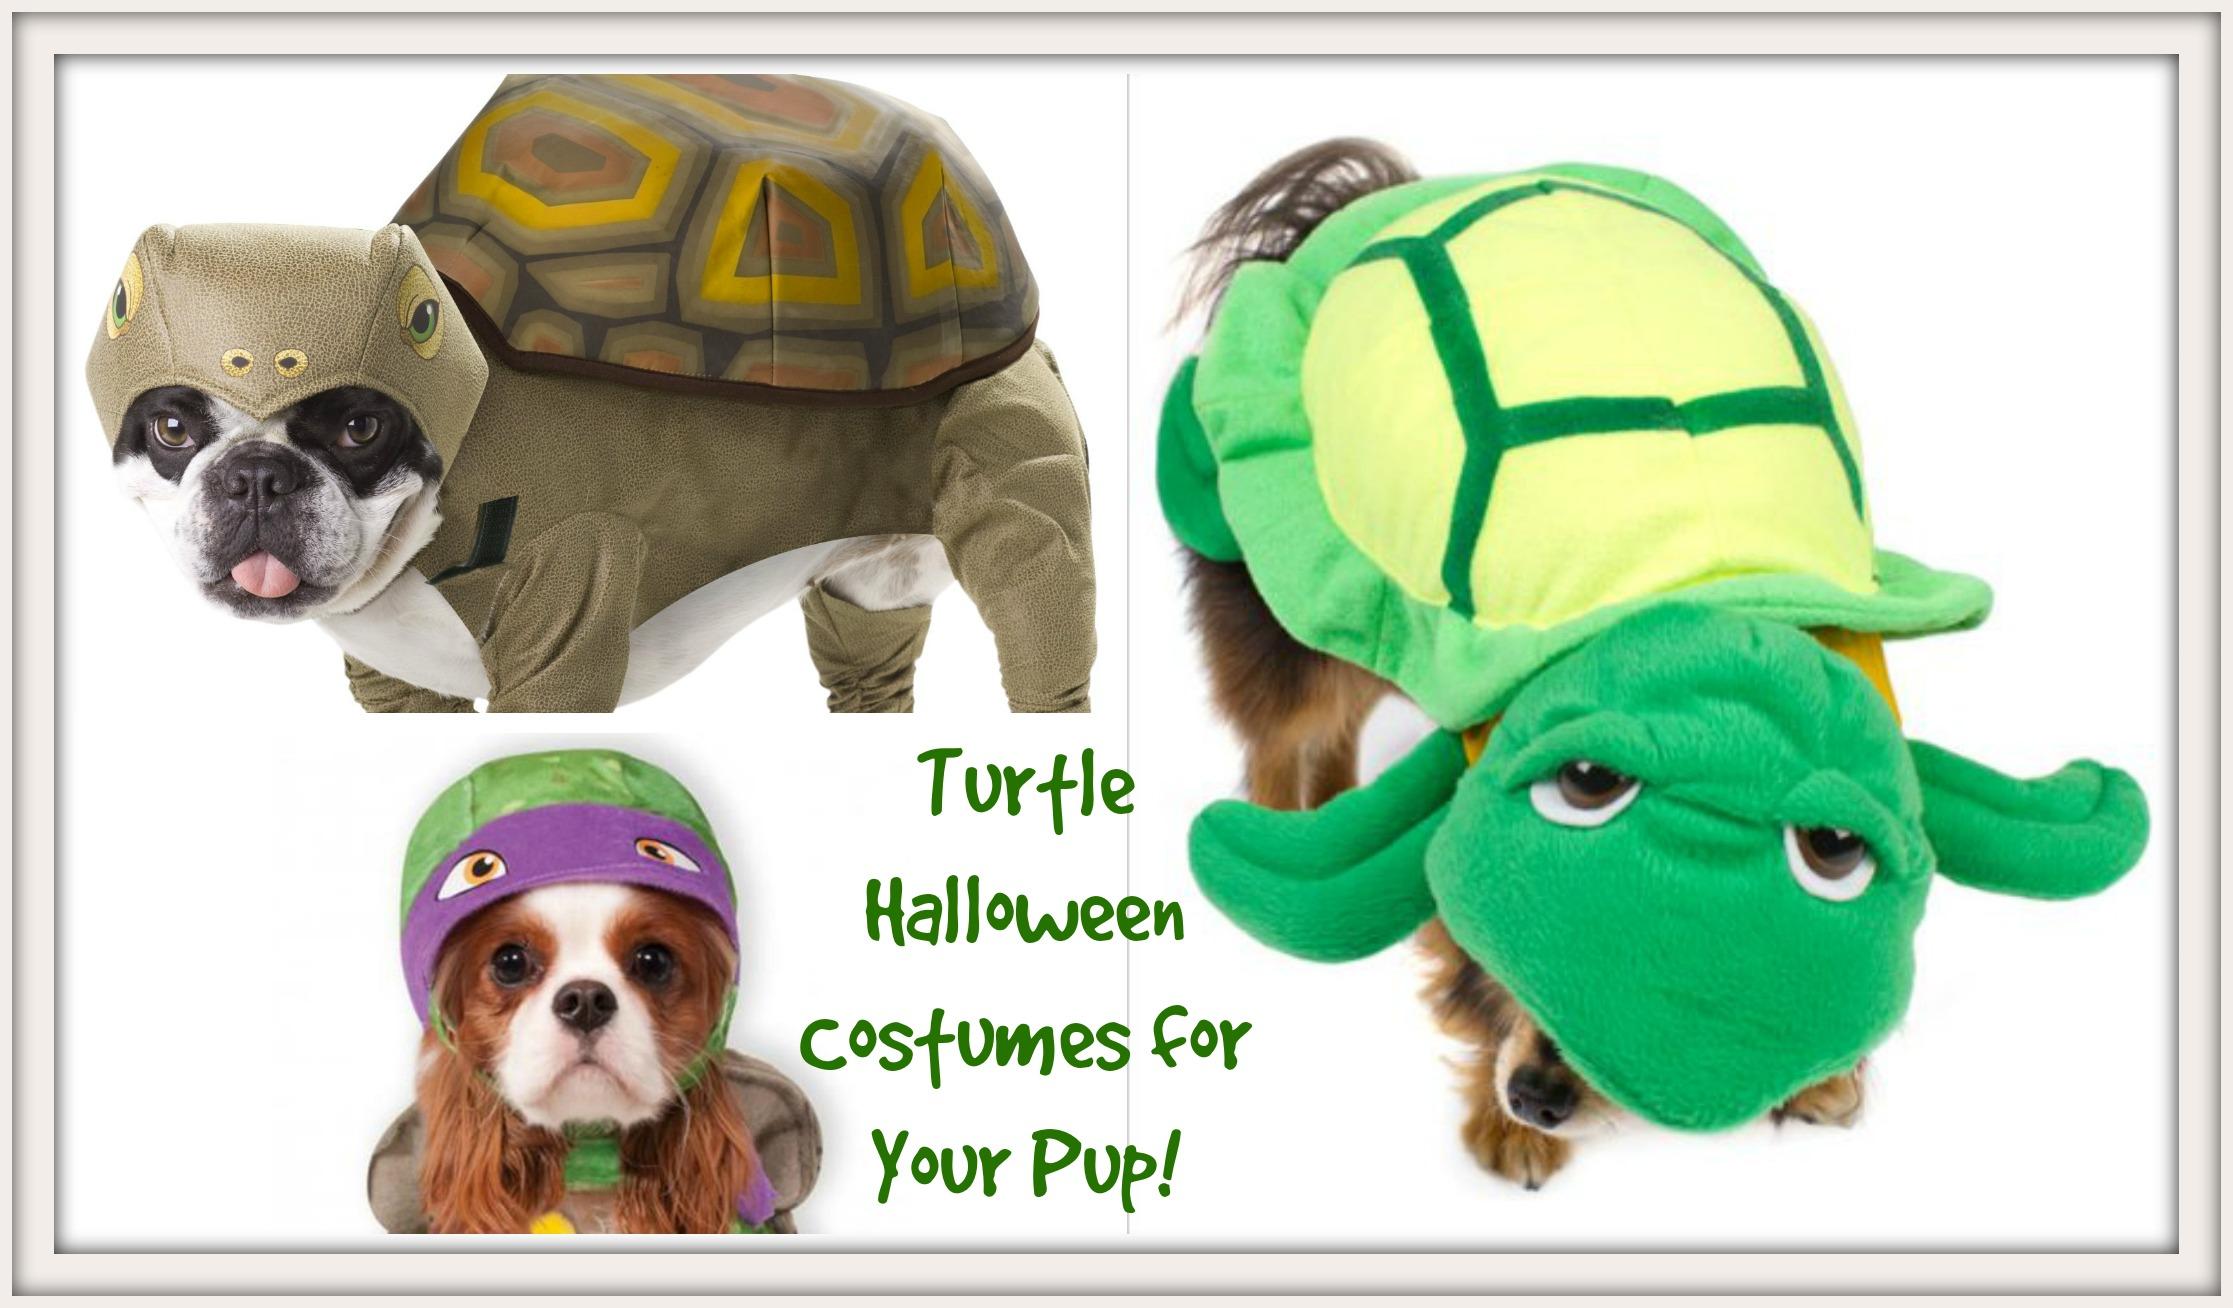 Dog Turtle Halloween Costumes